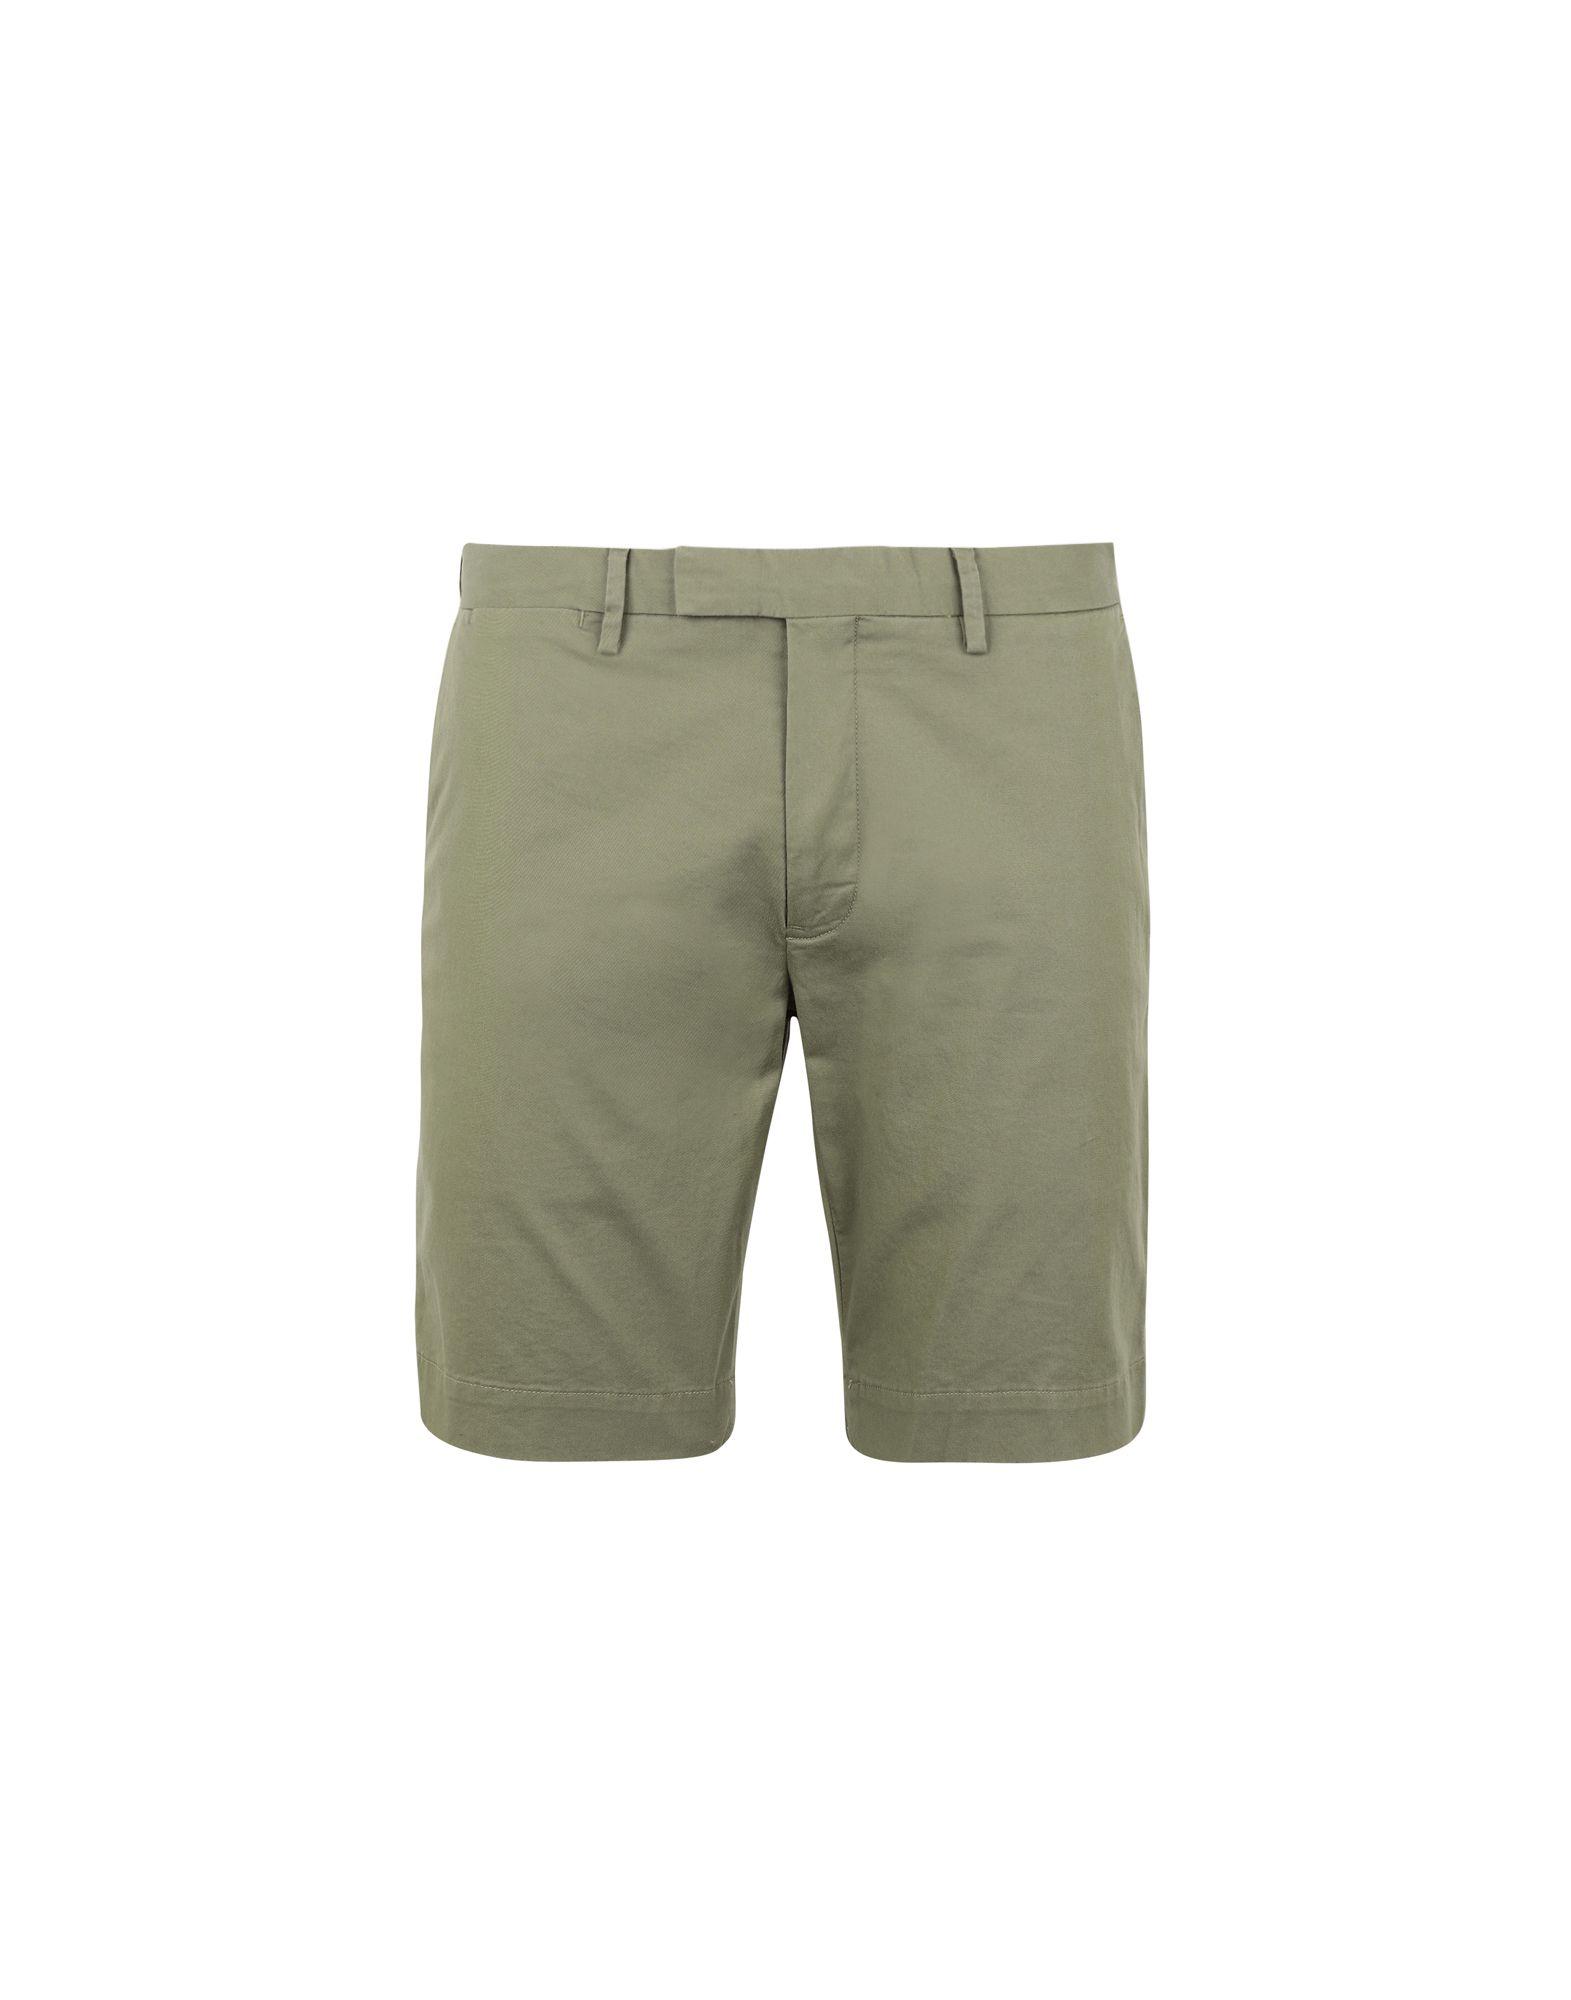 half off classic styles new release POLO RALPH LAUREN Shorts & Bermuda - Trousers   YOOX.COM